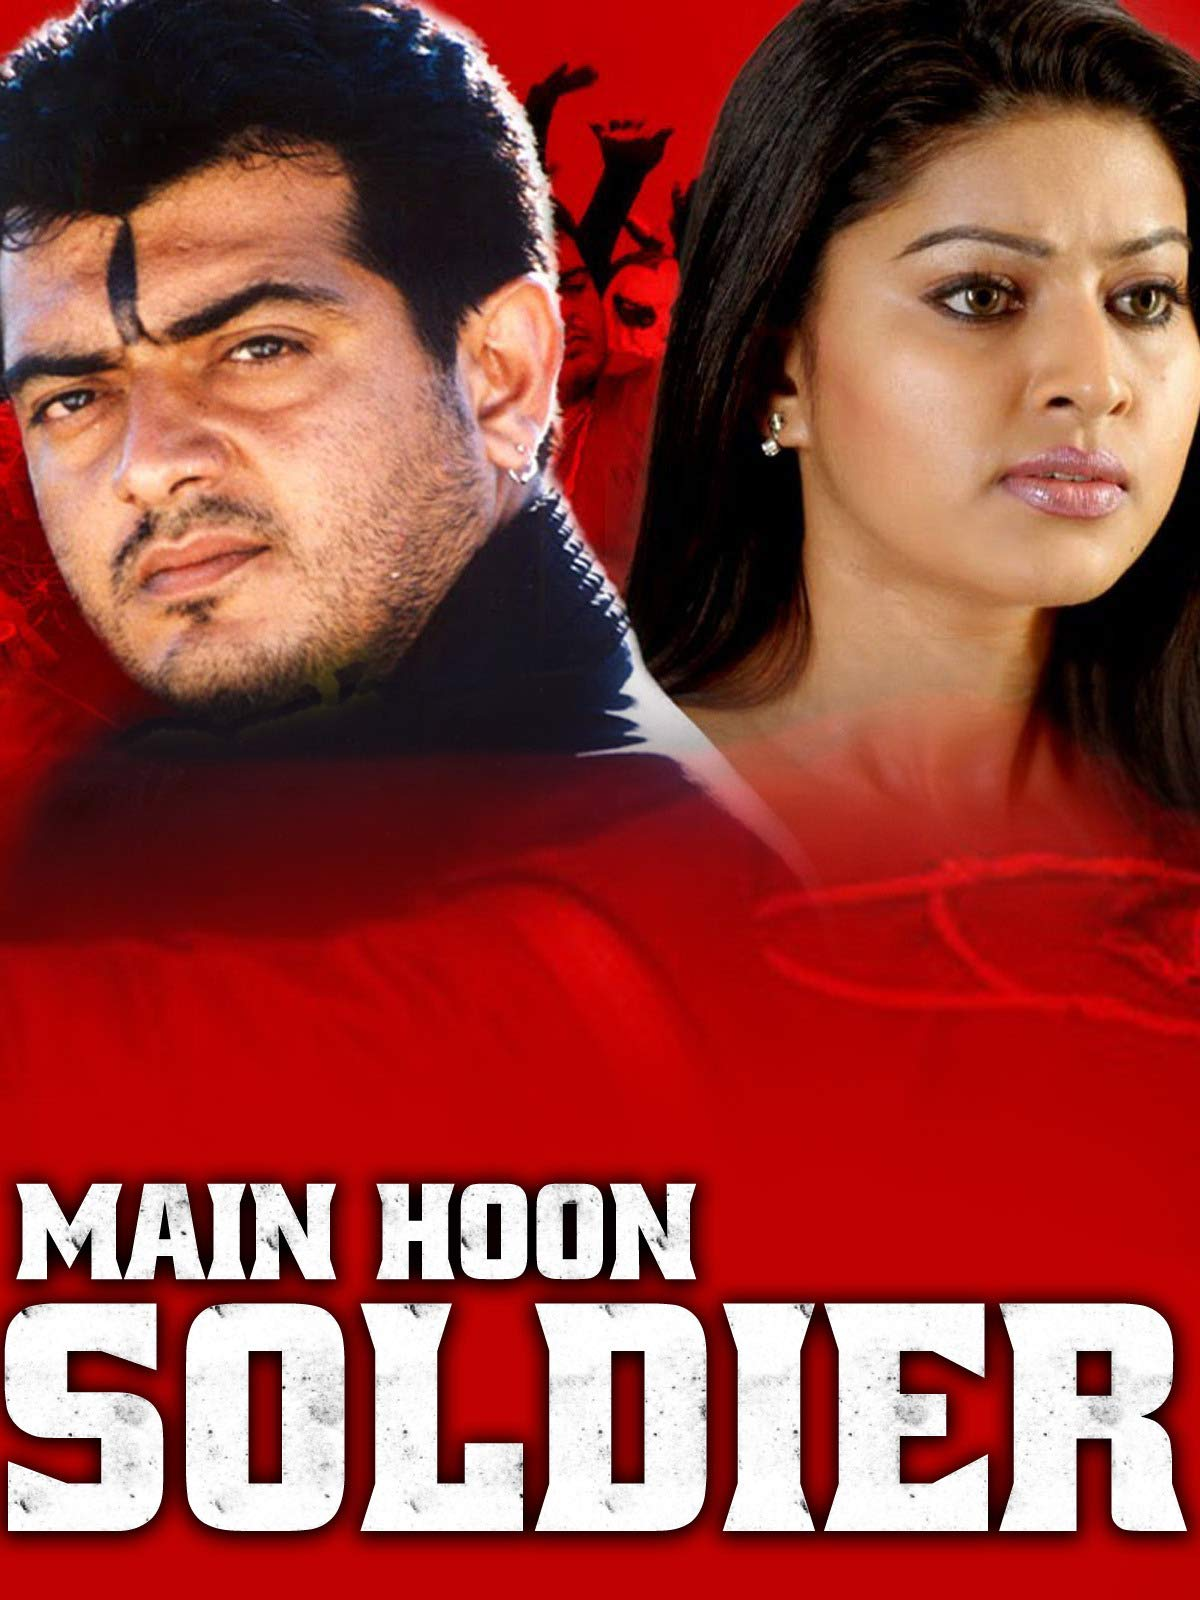 Main Hoon Soldier